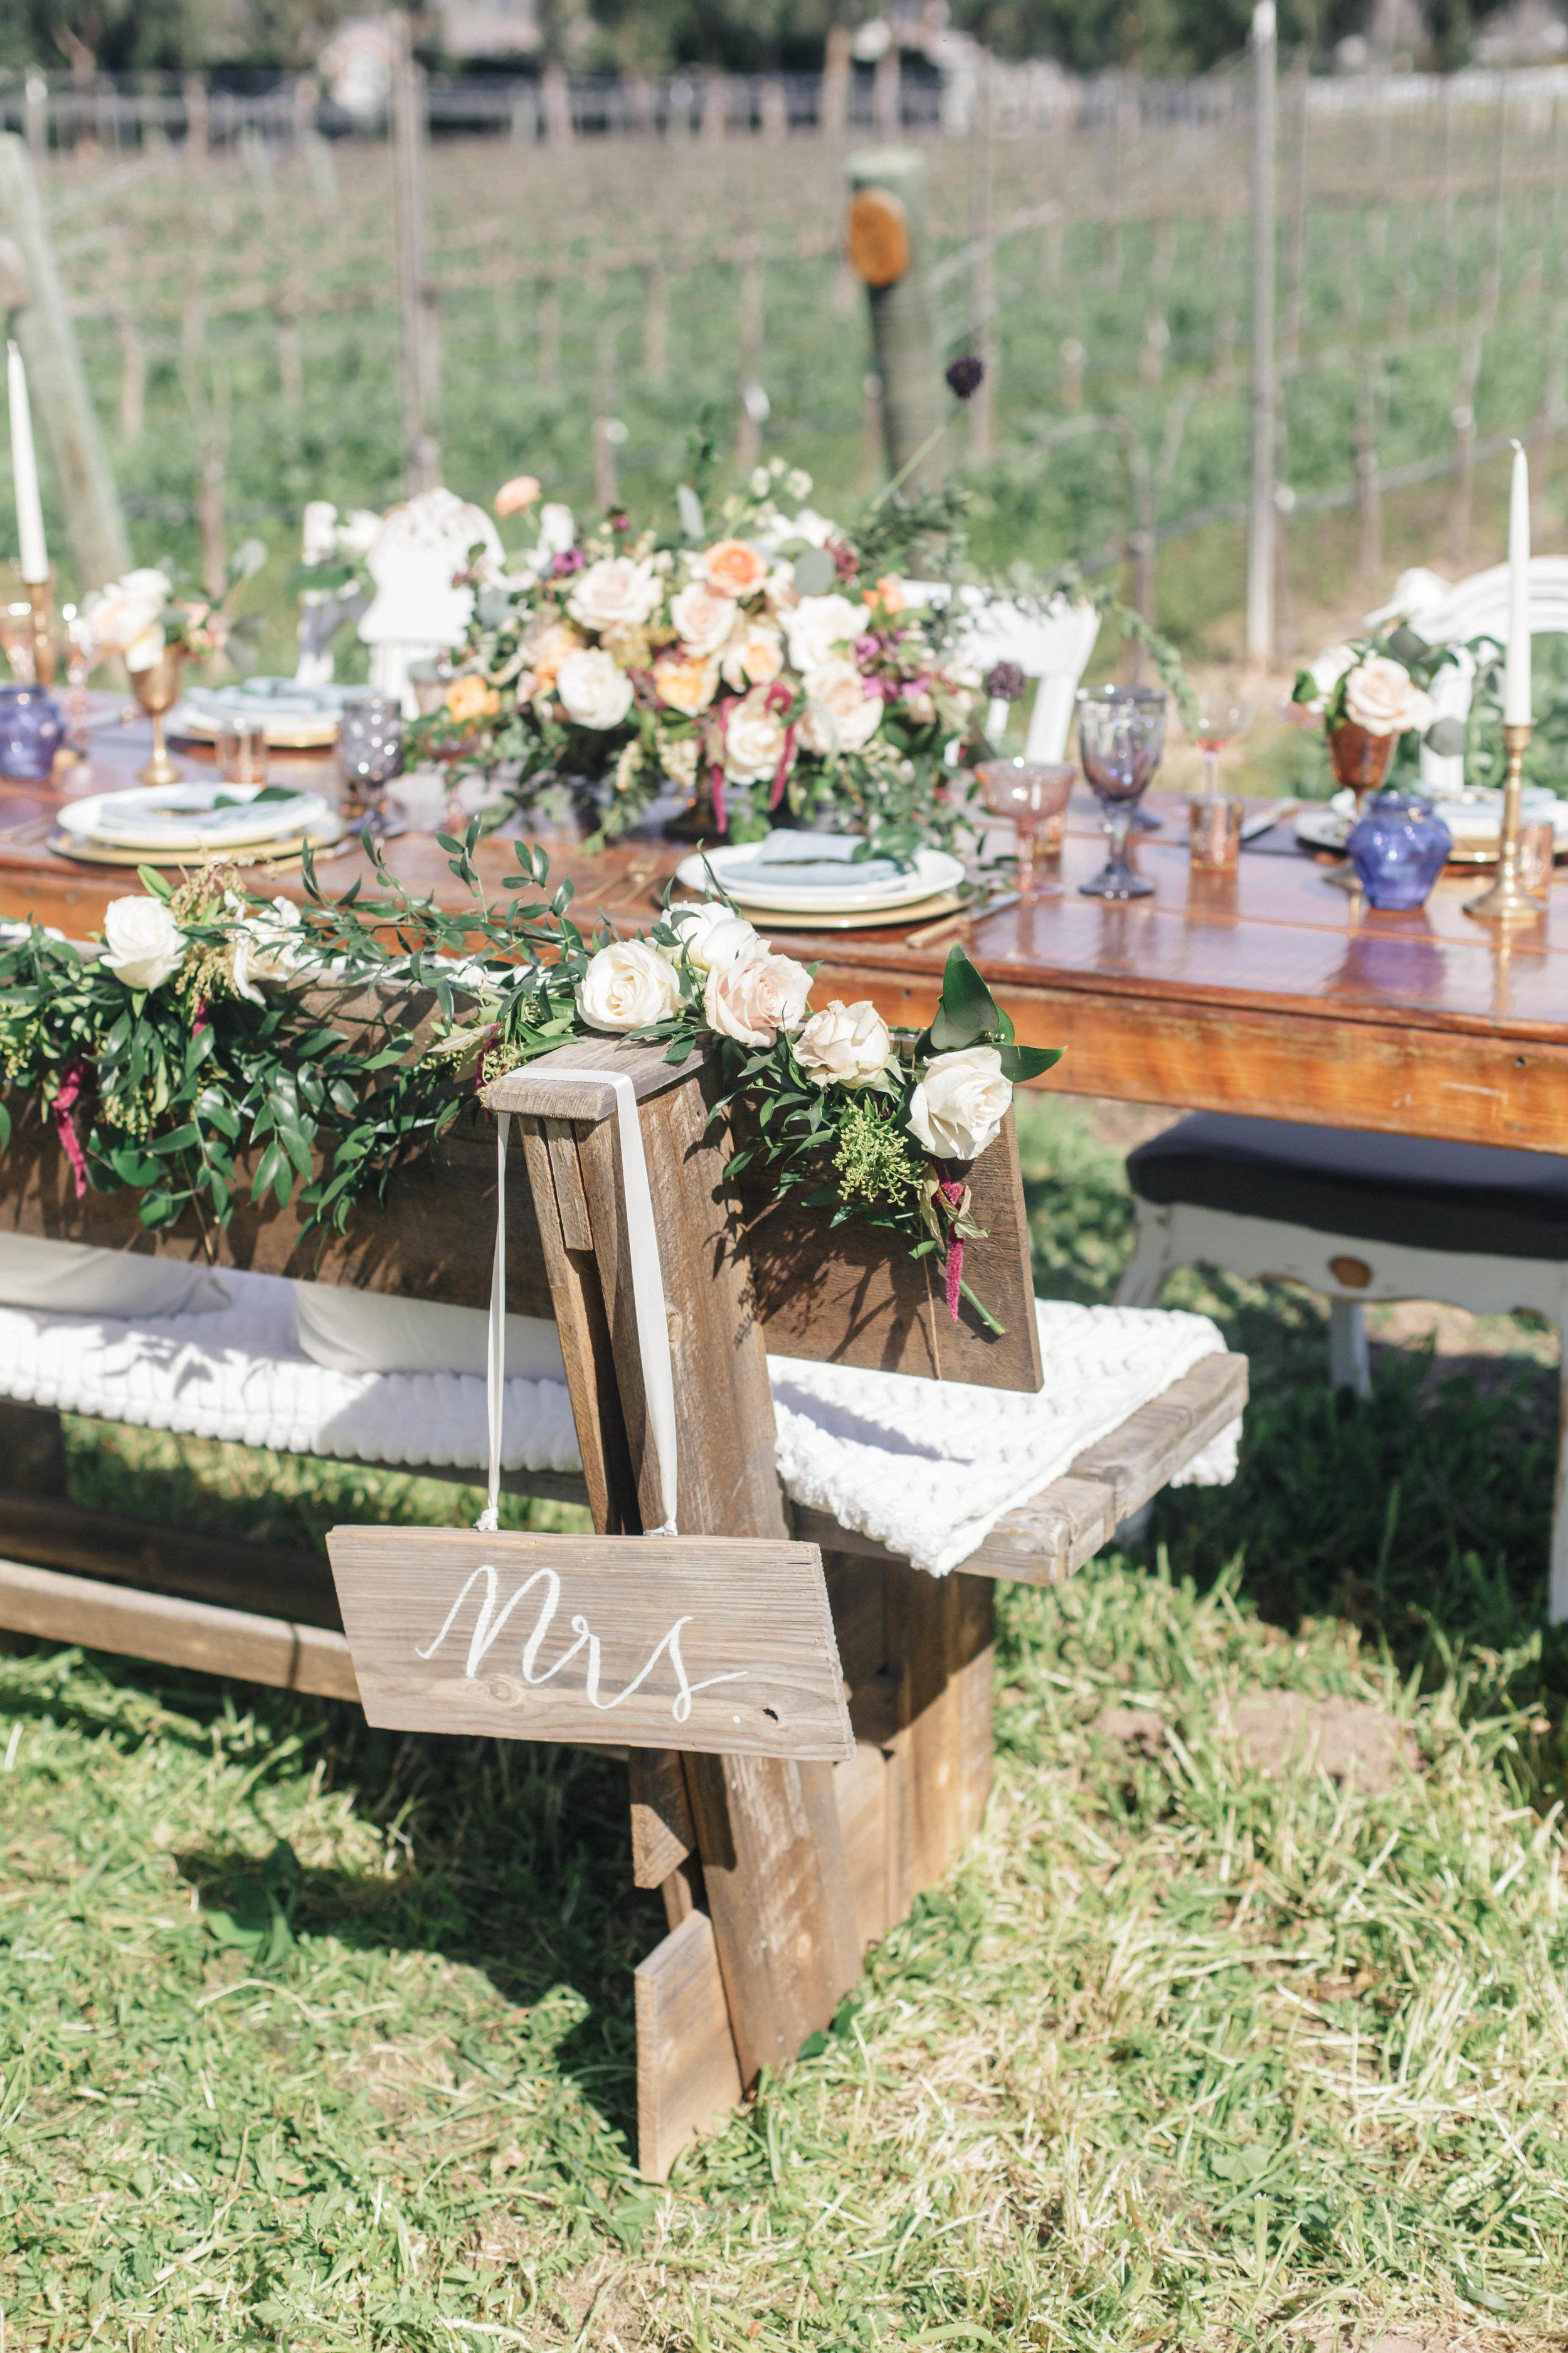 www.santabarbarawedding.com   Molly + Co   Sogno Del Fiore   Reception Table Details